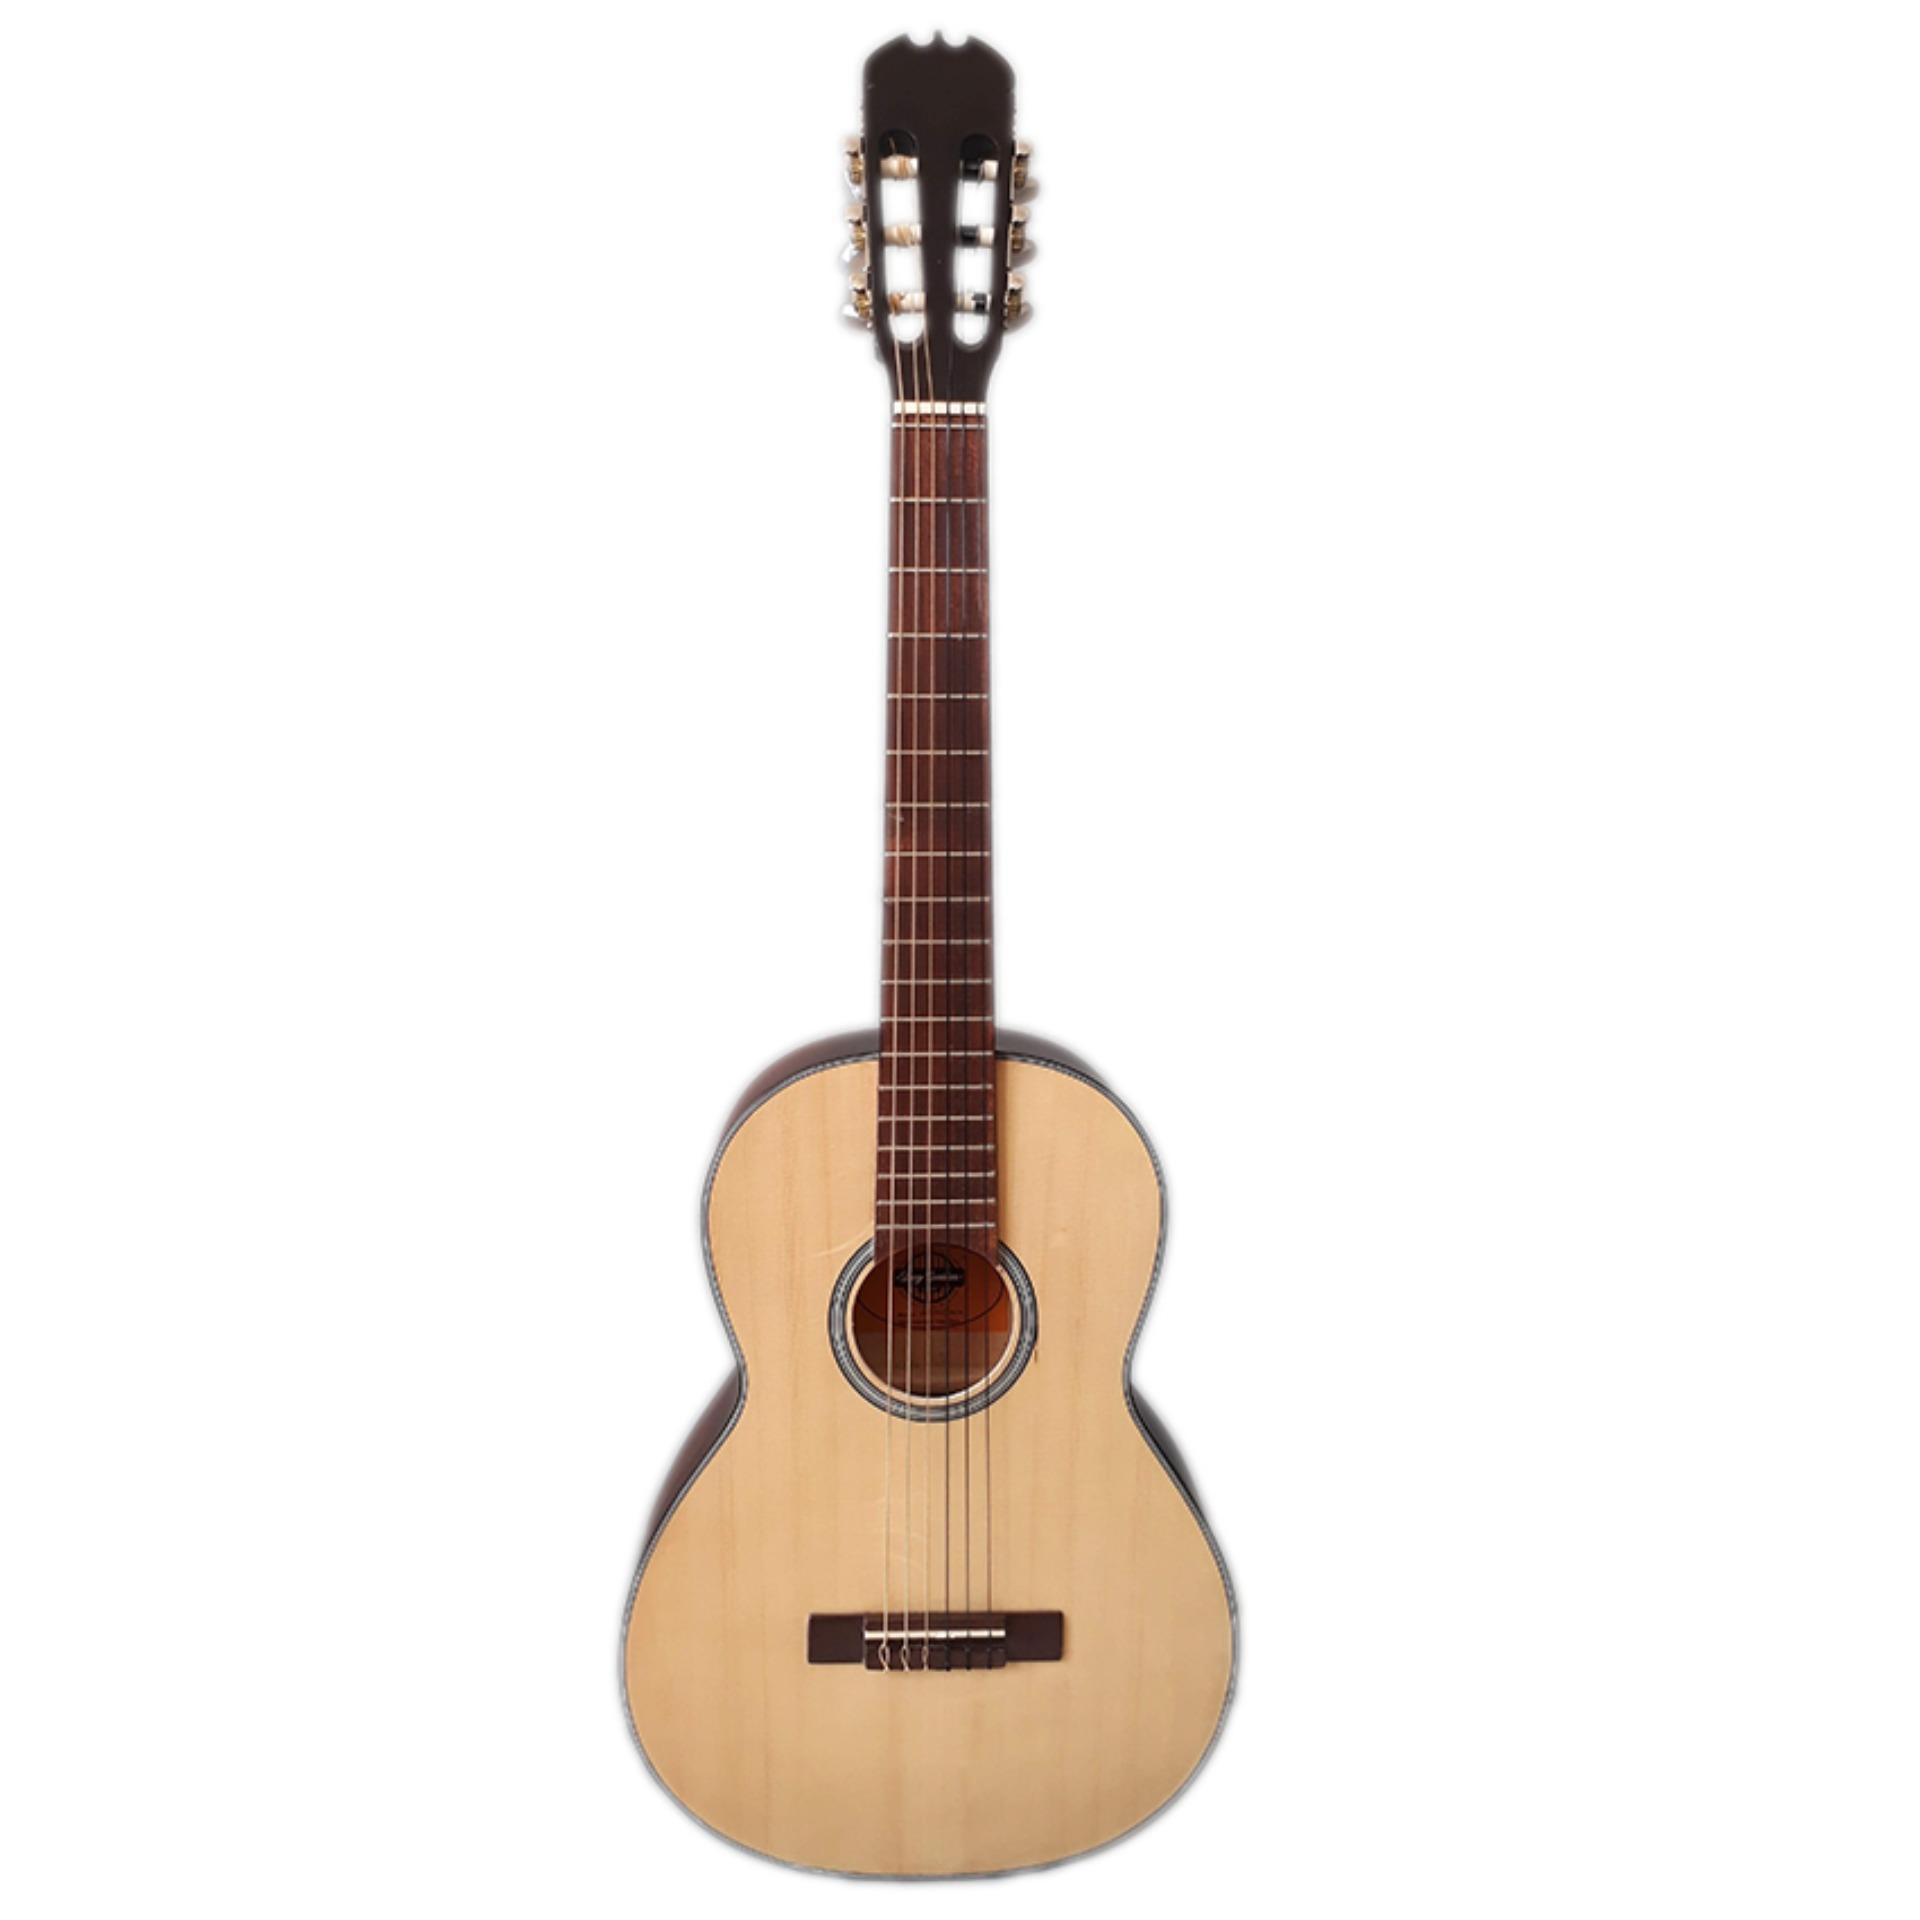 Đàn Guitar Classic mini đàn guitar classic size 3/4  DVE70C mini trẻ em - size 3/4 (màu gỗ) + Tặng Bao da